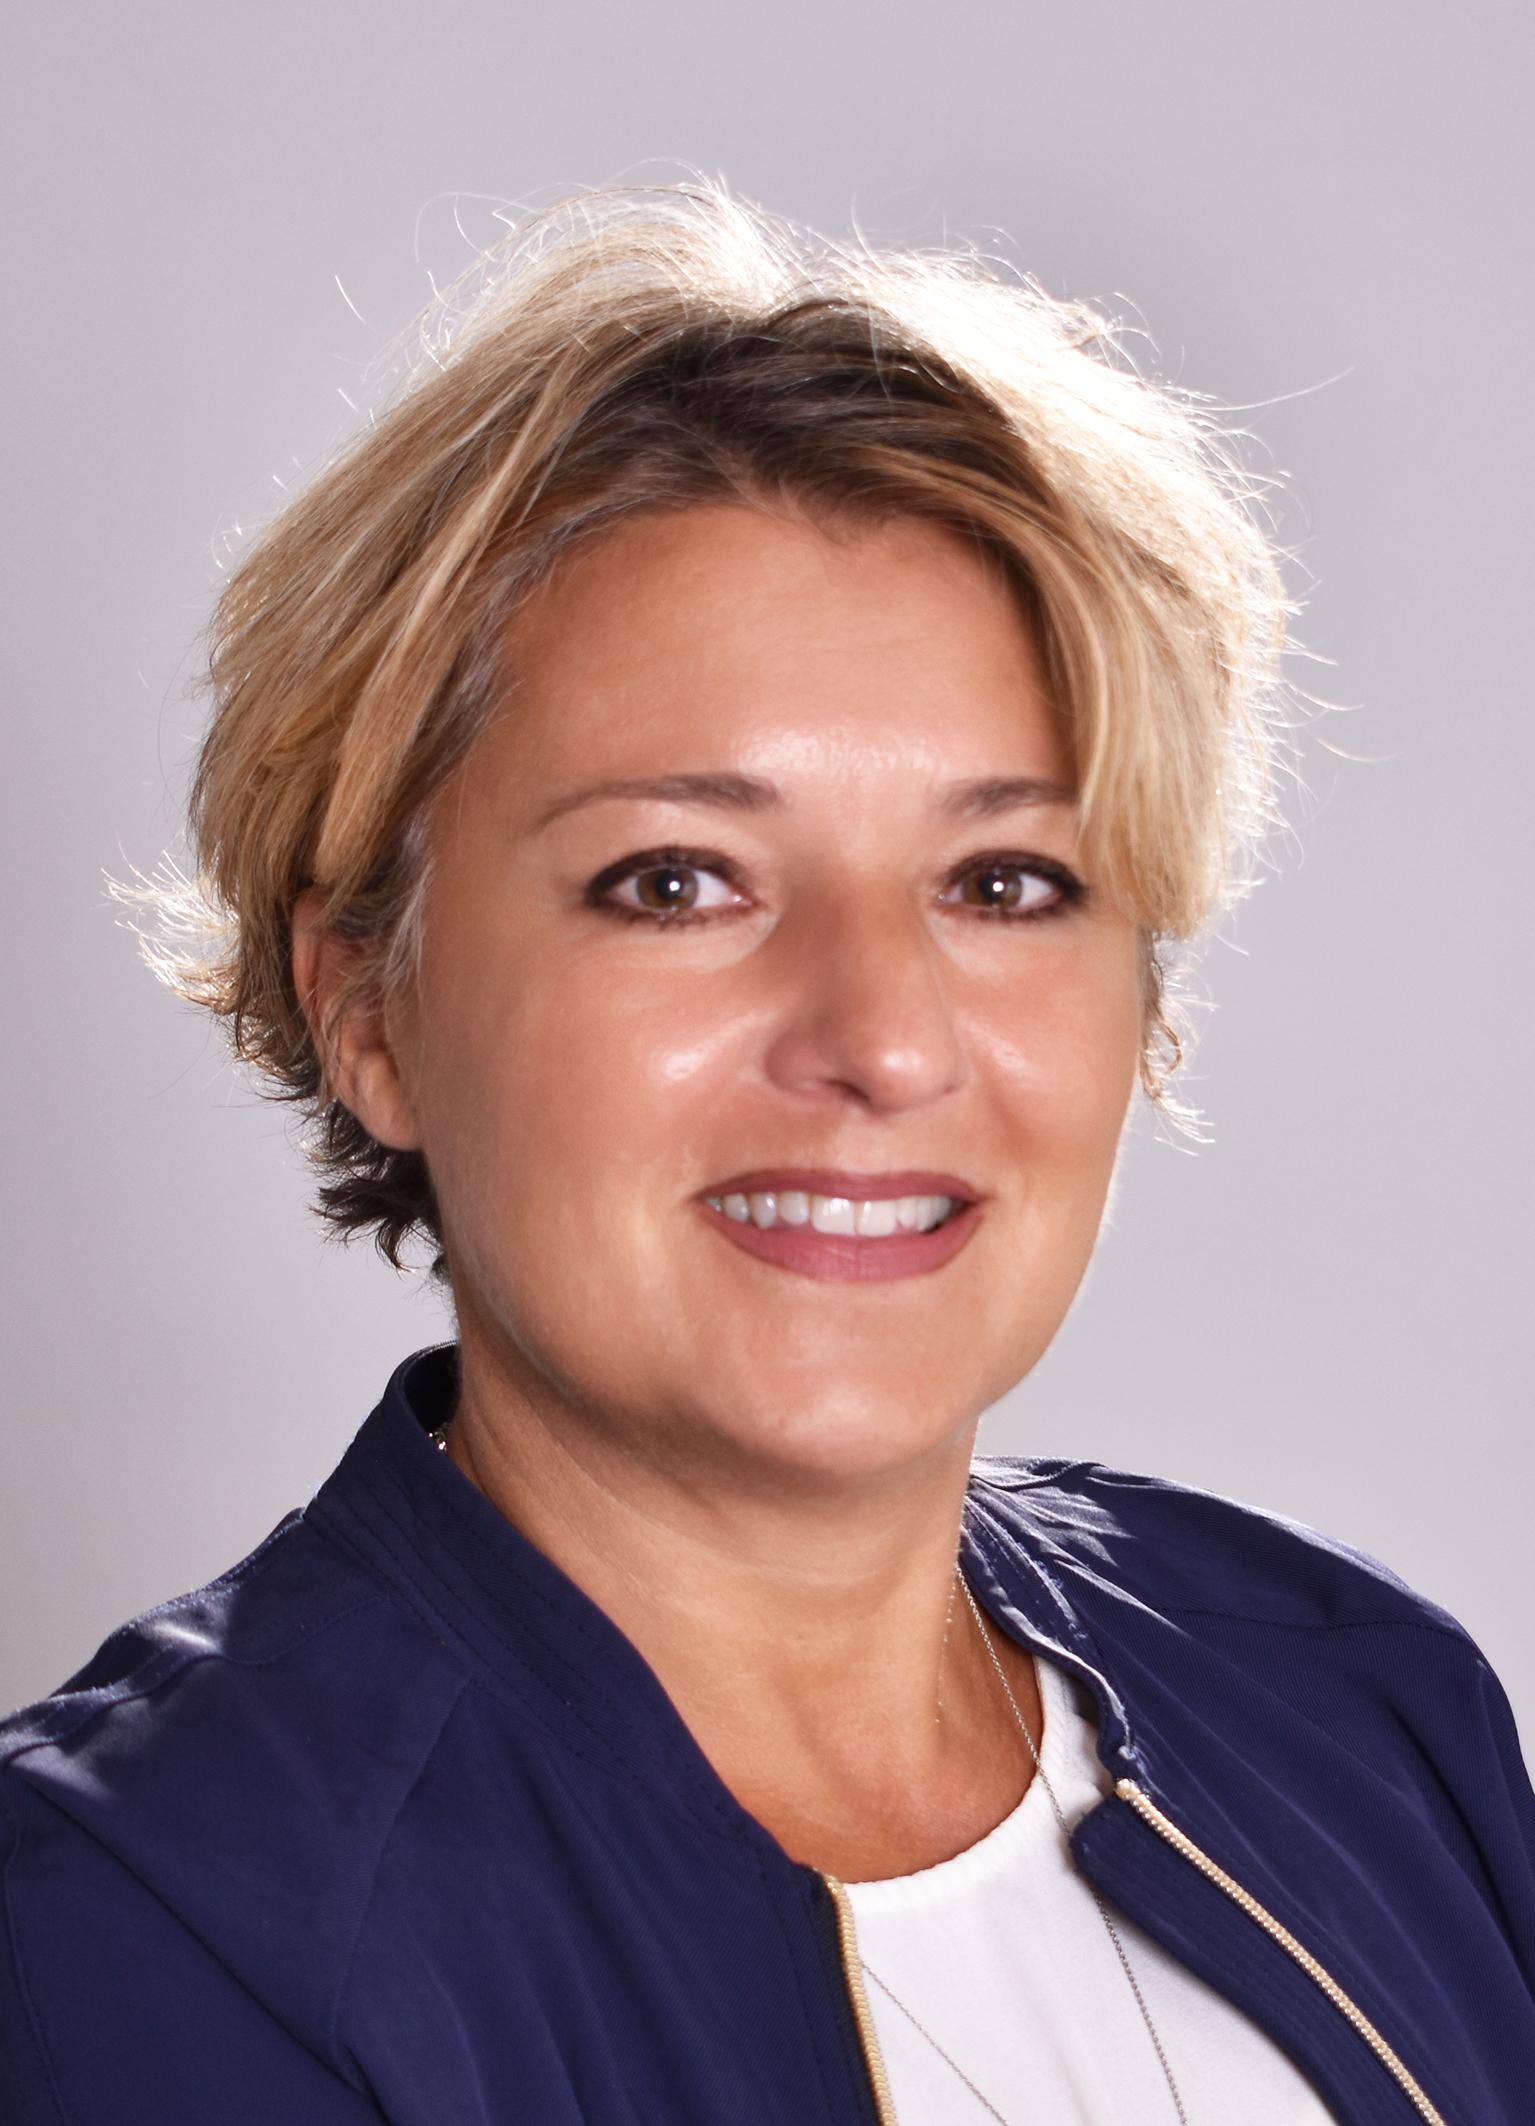 Cécile Debesse